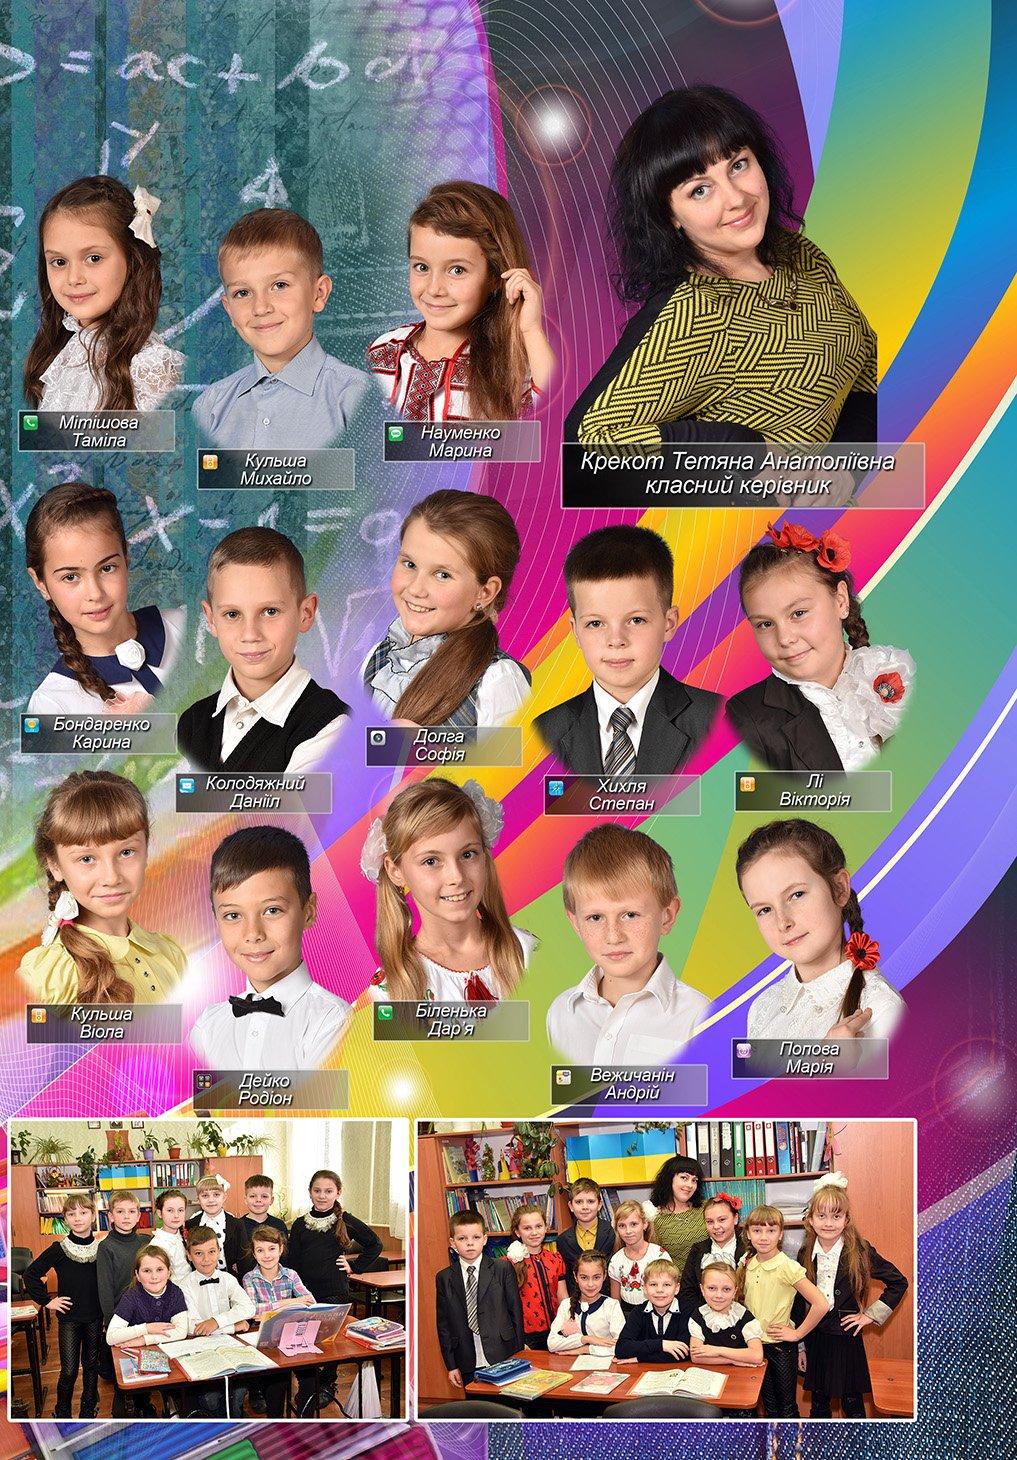 https://school-photo.com.ua/wp-content/uploads/2017/07/03-15.jpg